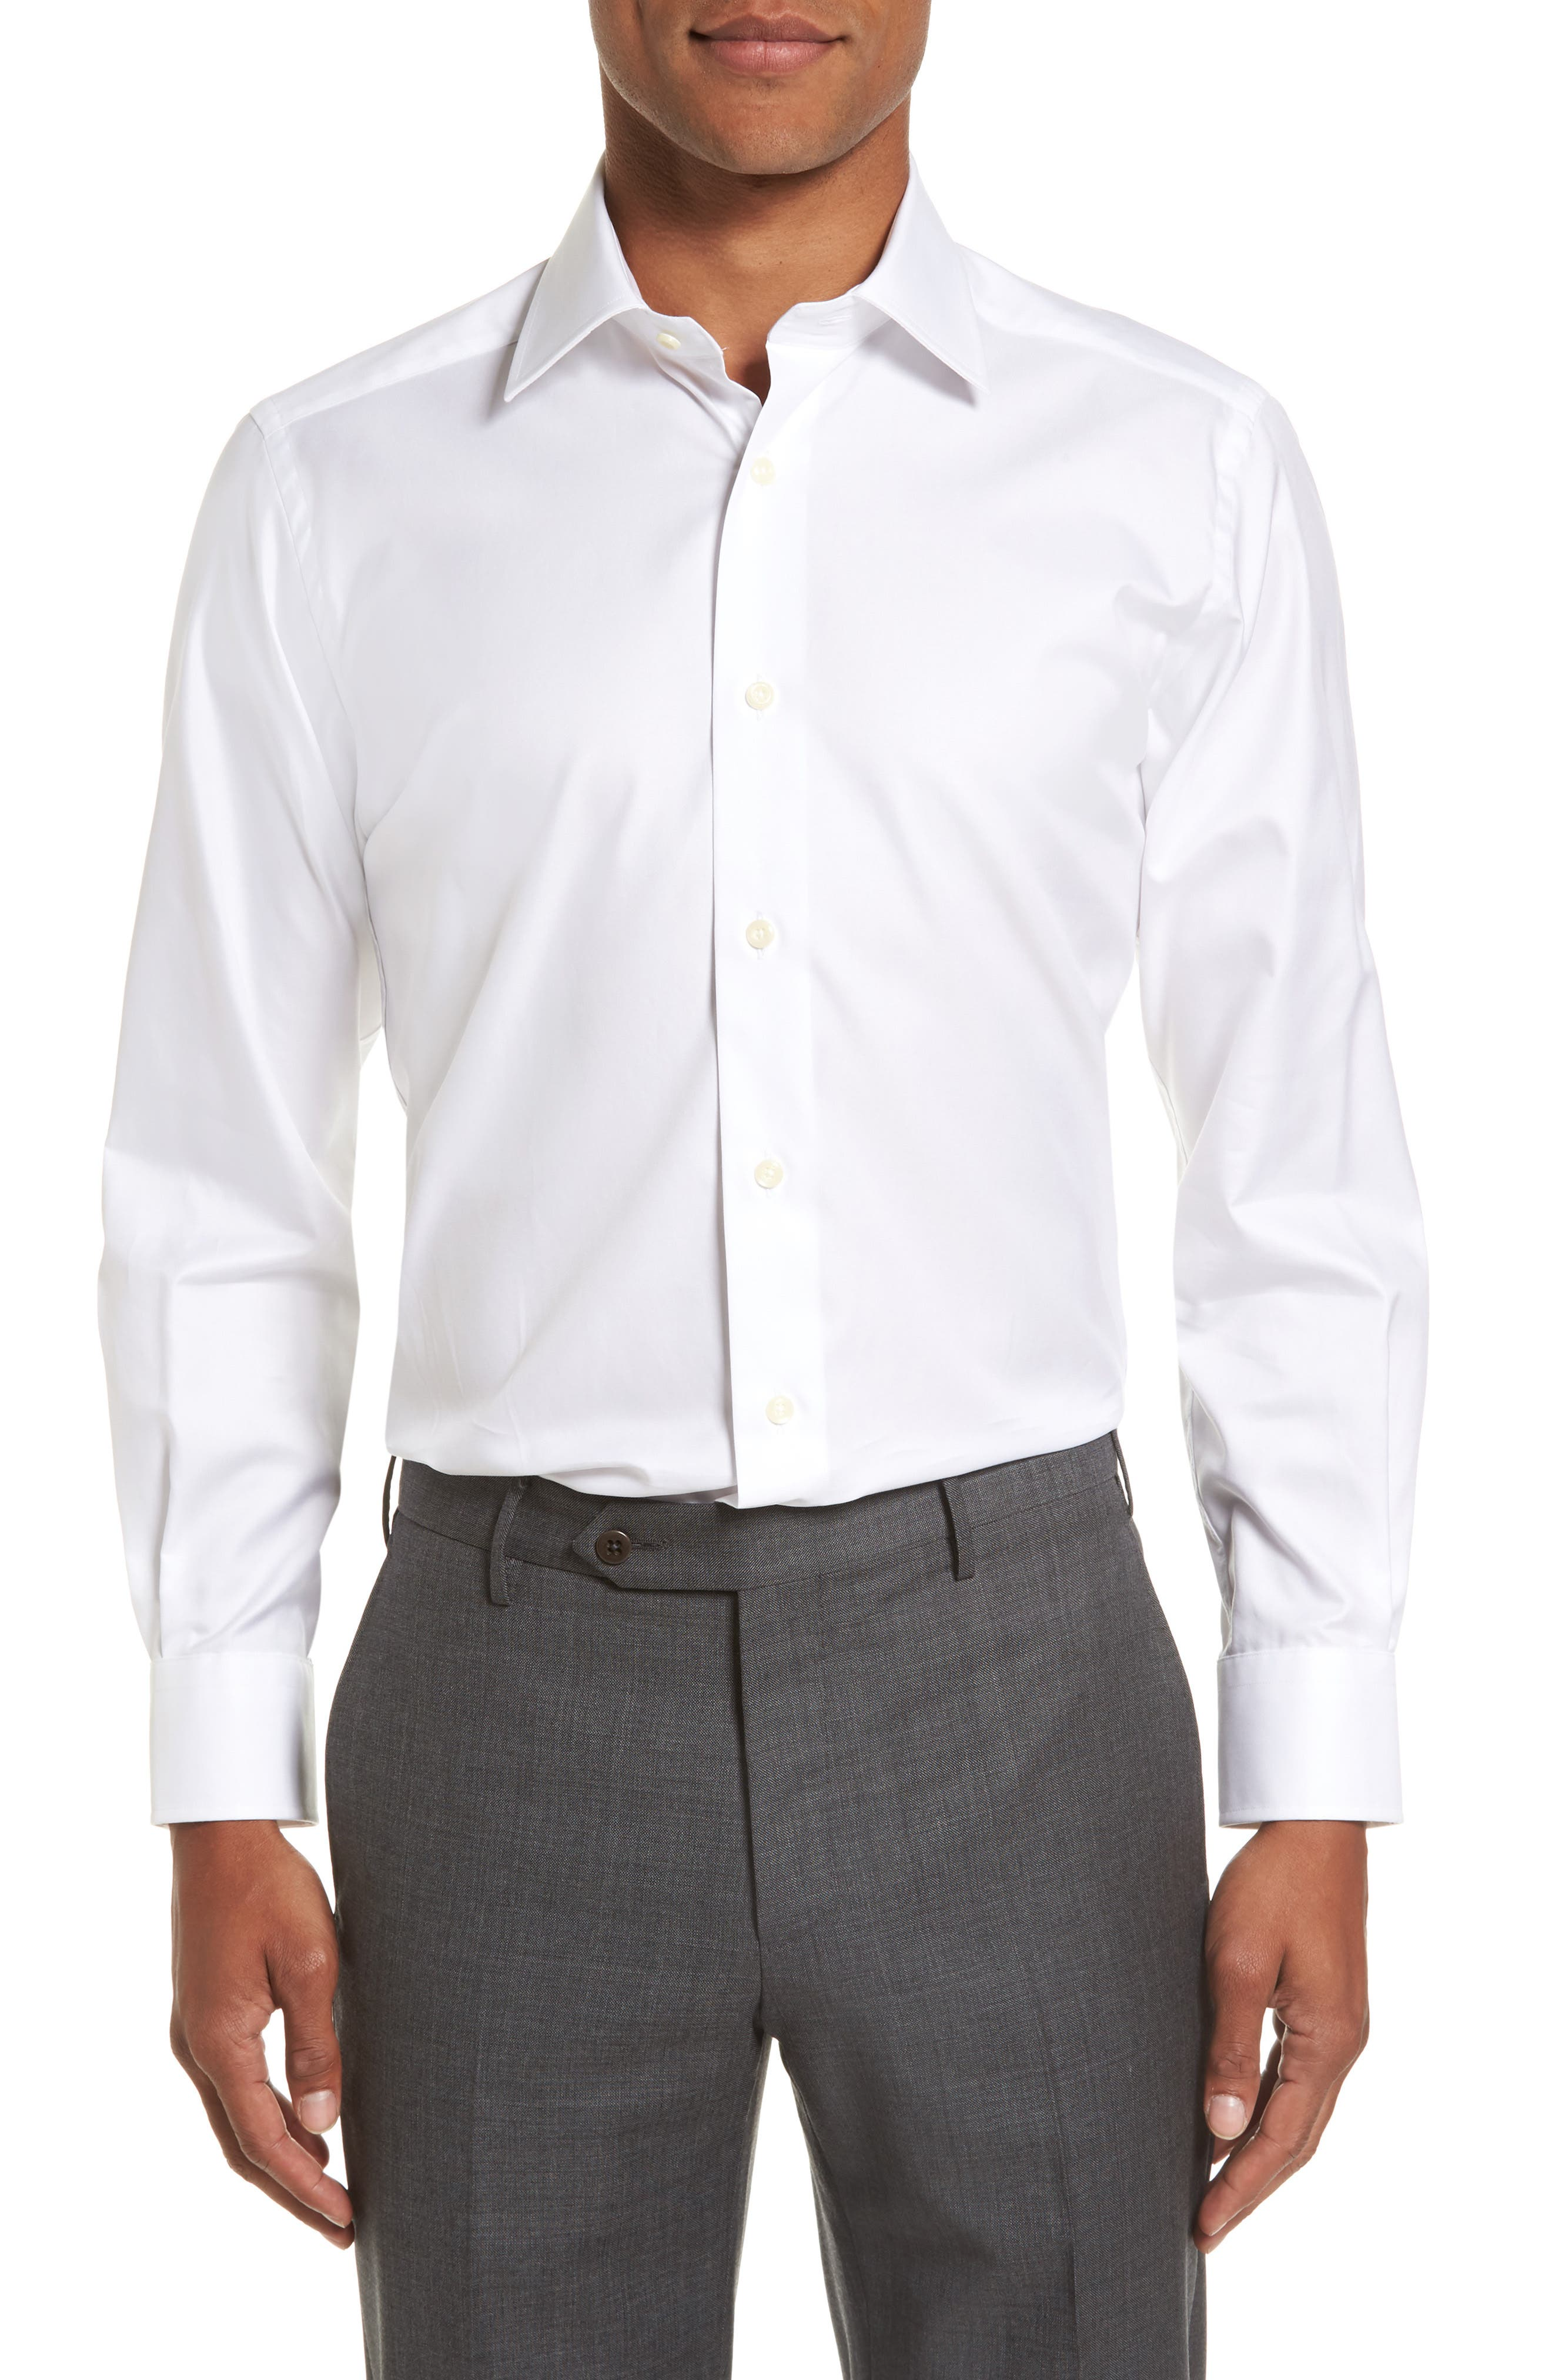 Main Image - David Donahue Trim Fit Solid Dress Shirt